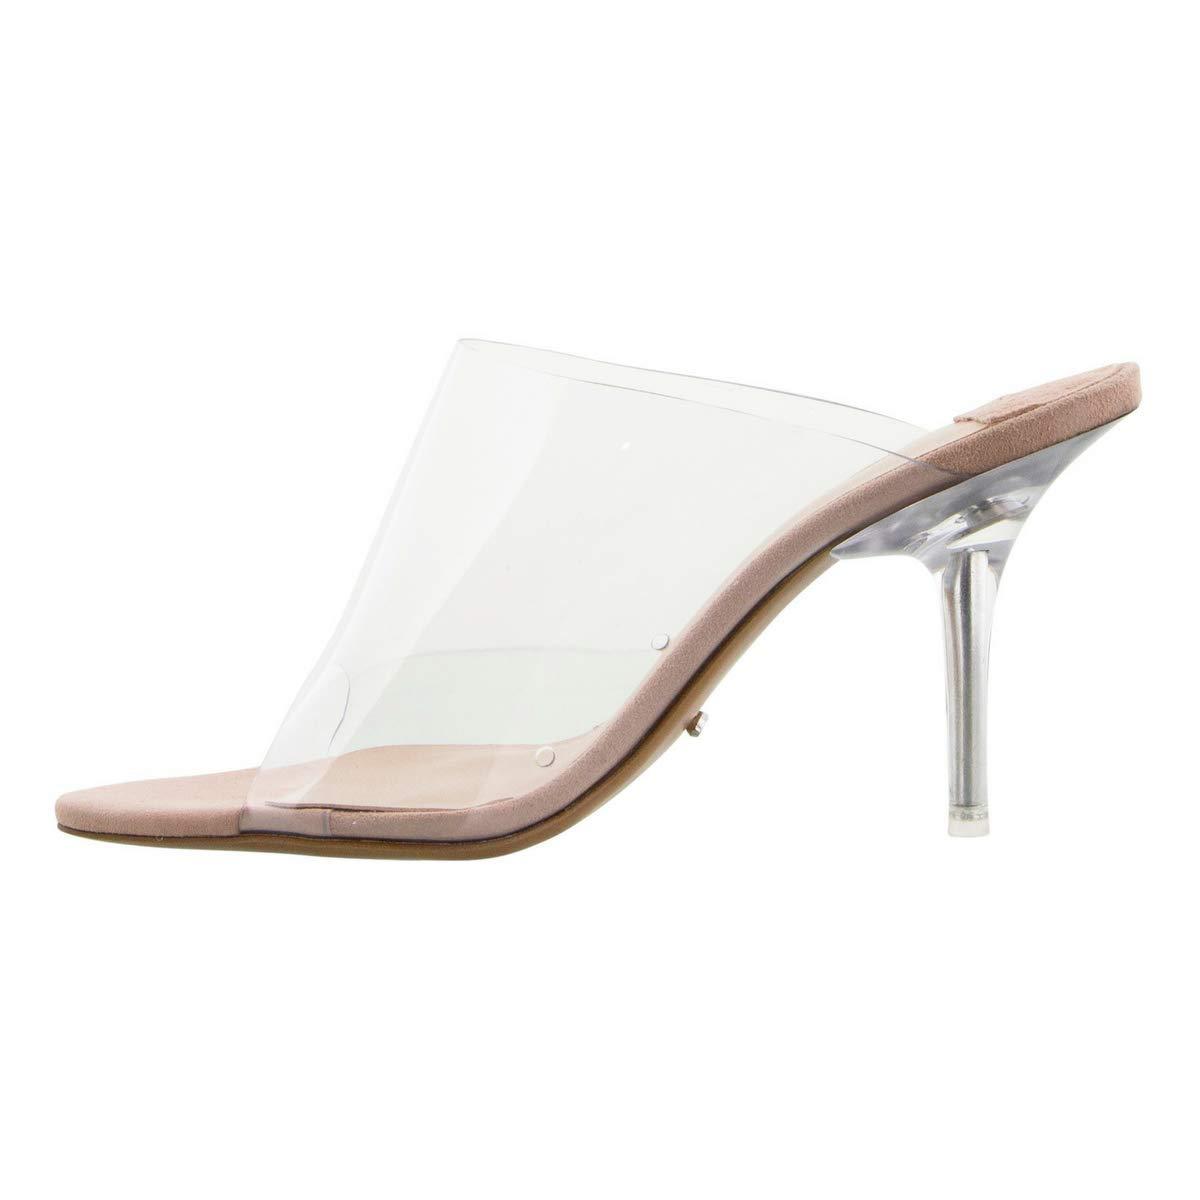 Clear Vinyalite Upper Slip On Mule with Open Toe and Clear Stiletto Heels Tony Bianco Indigo Stiletto Heels